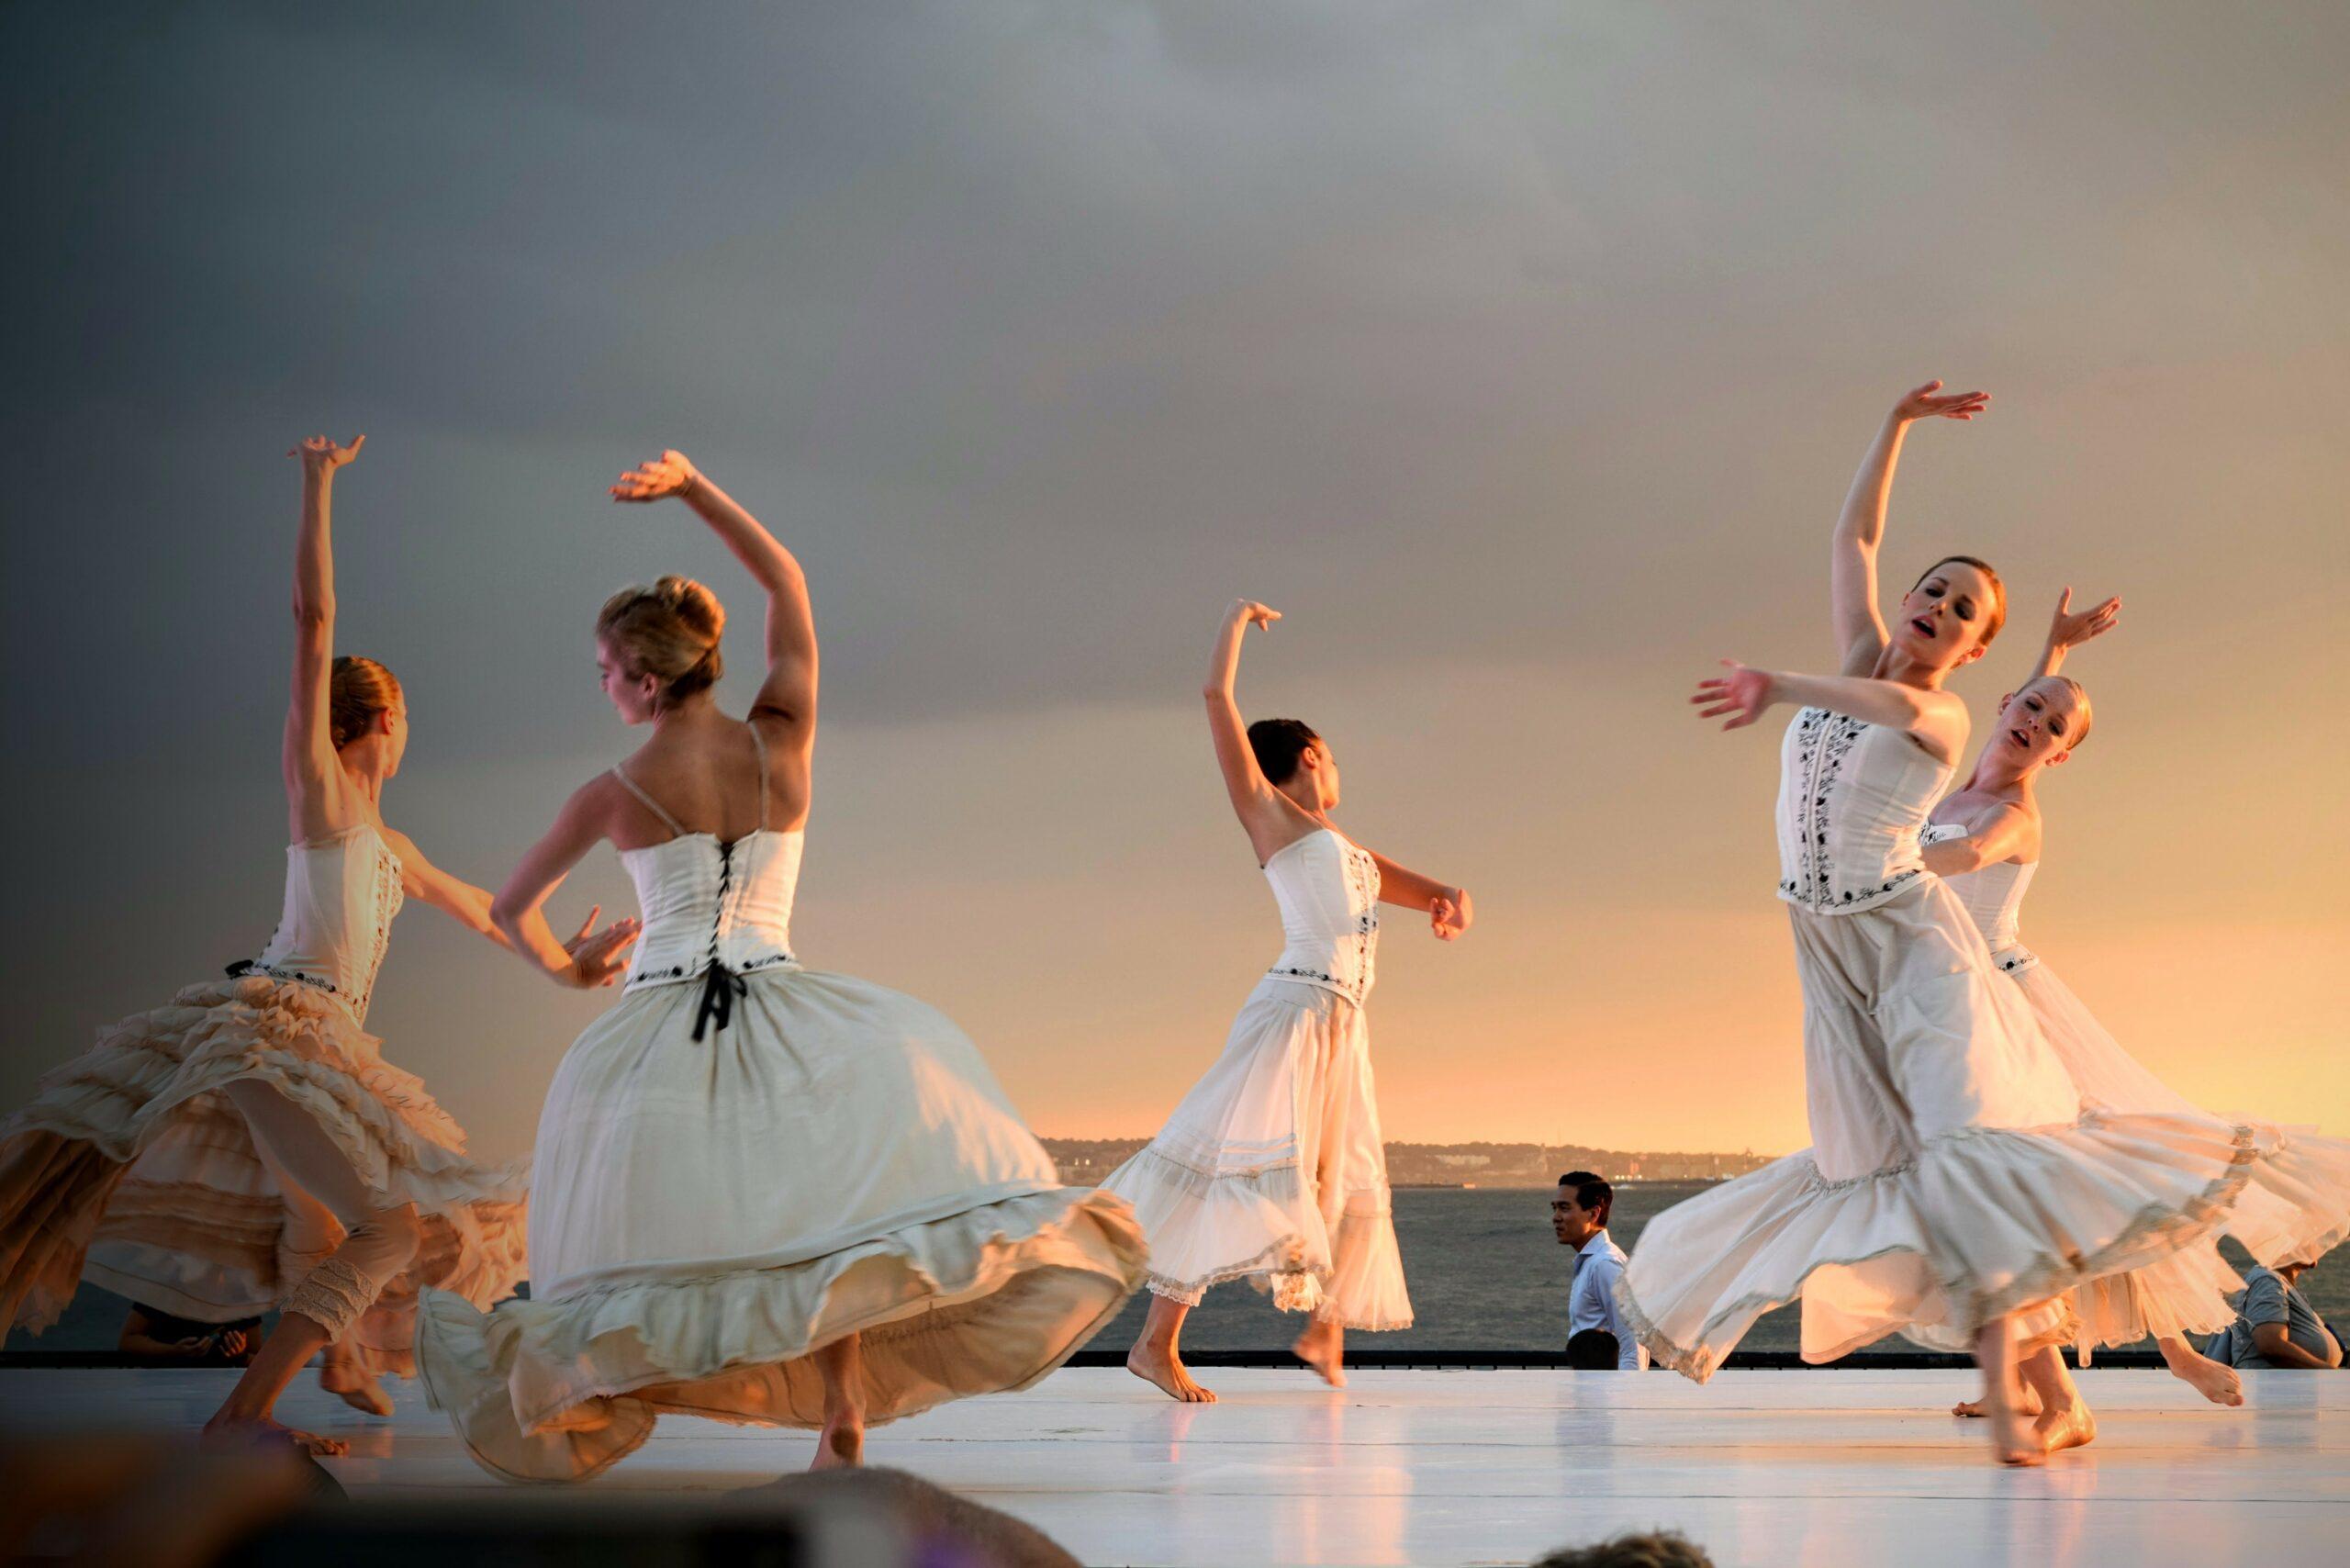 dancing performance arts